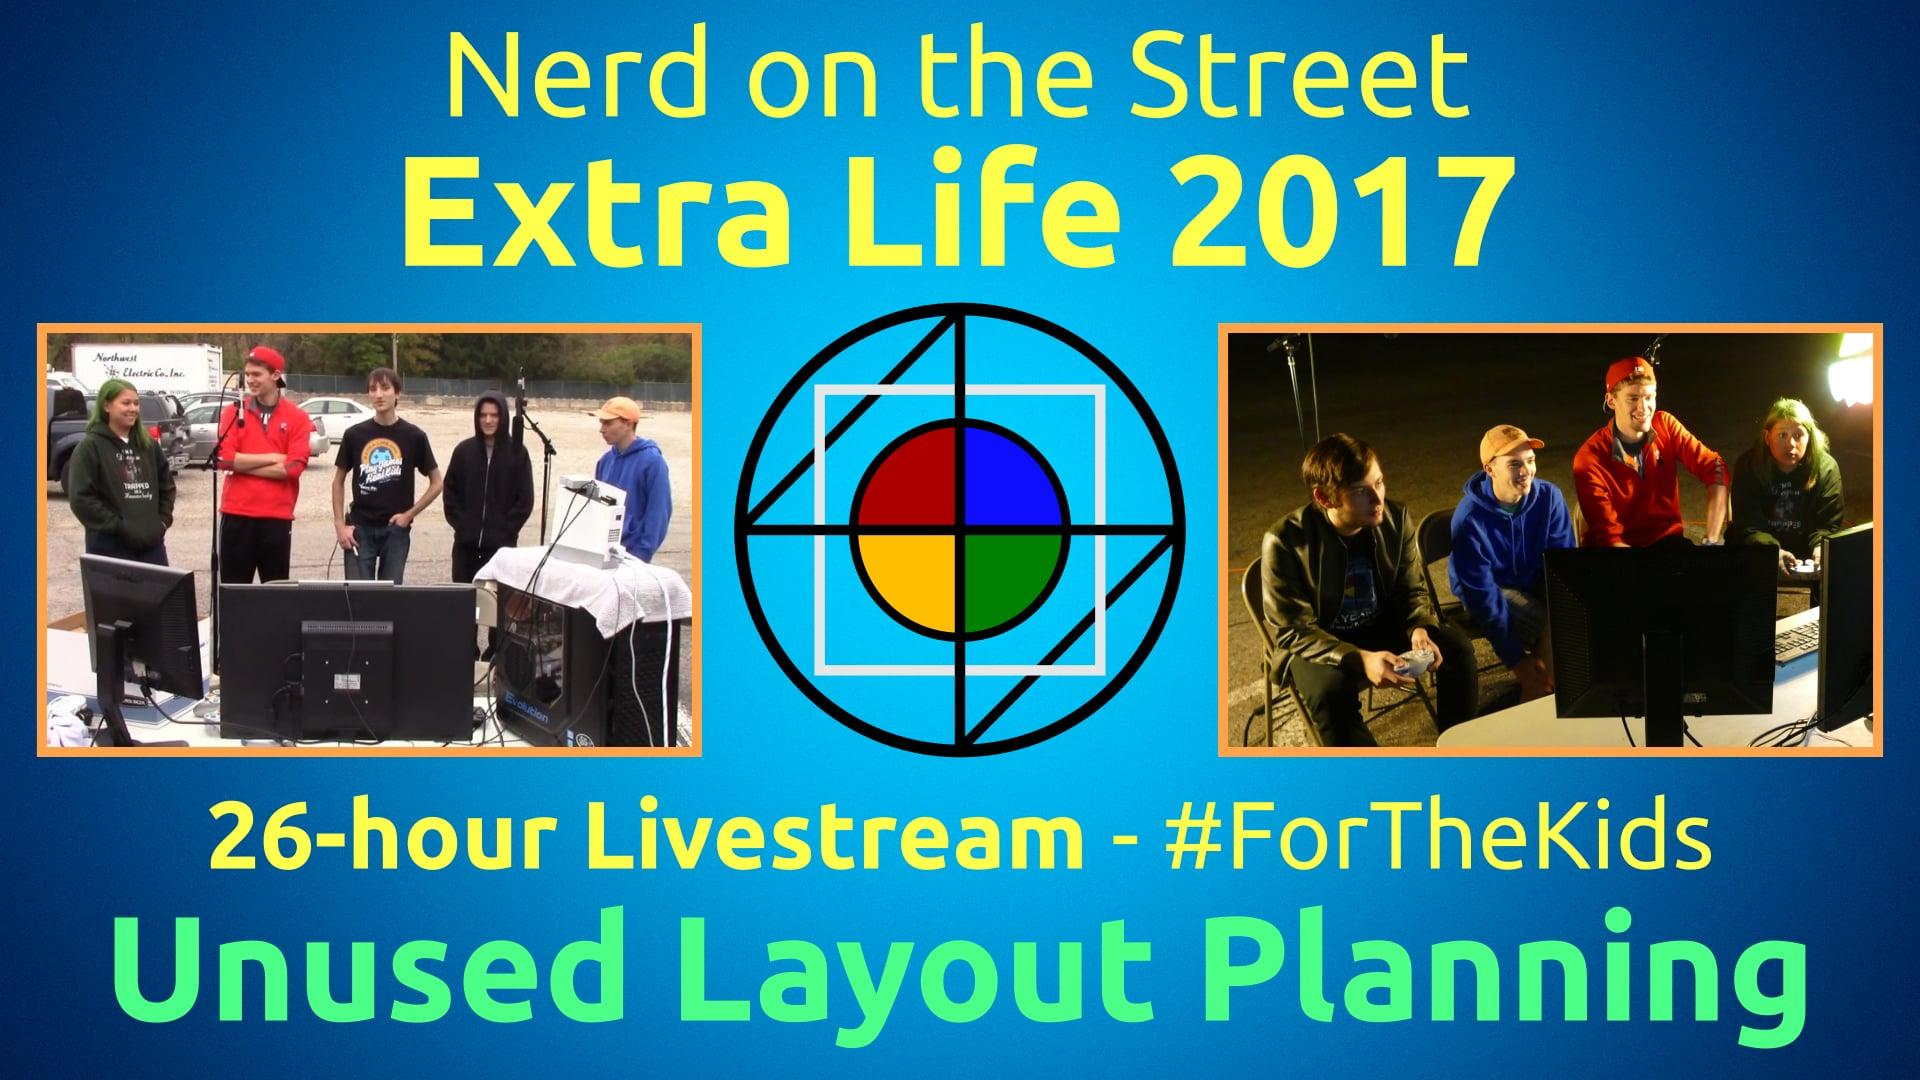 Unused Layout Planning - Extra Life 2017